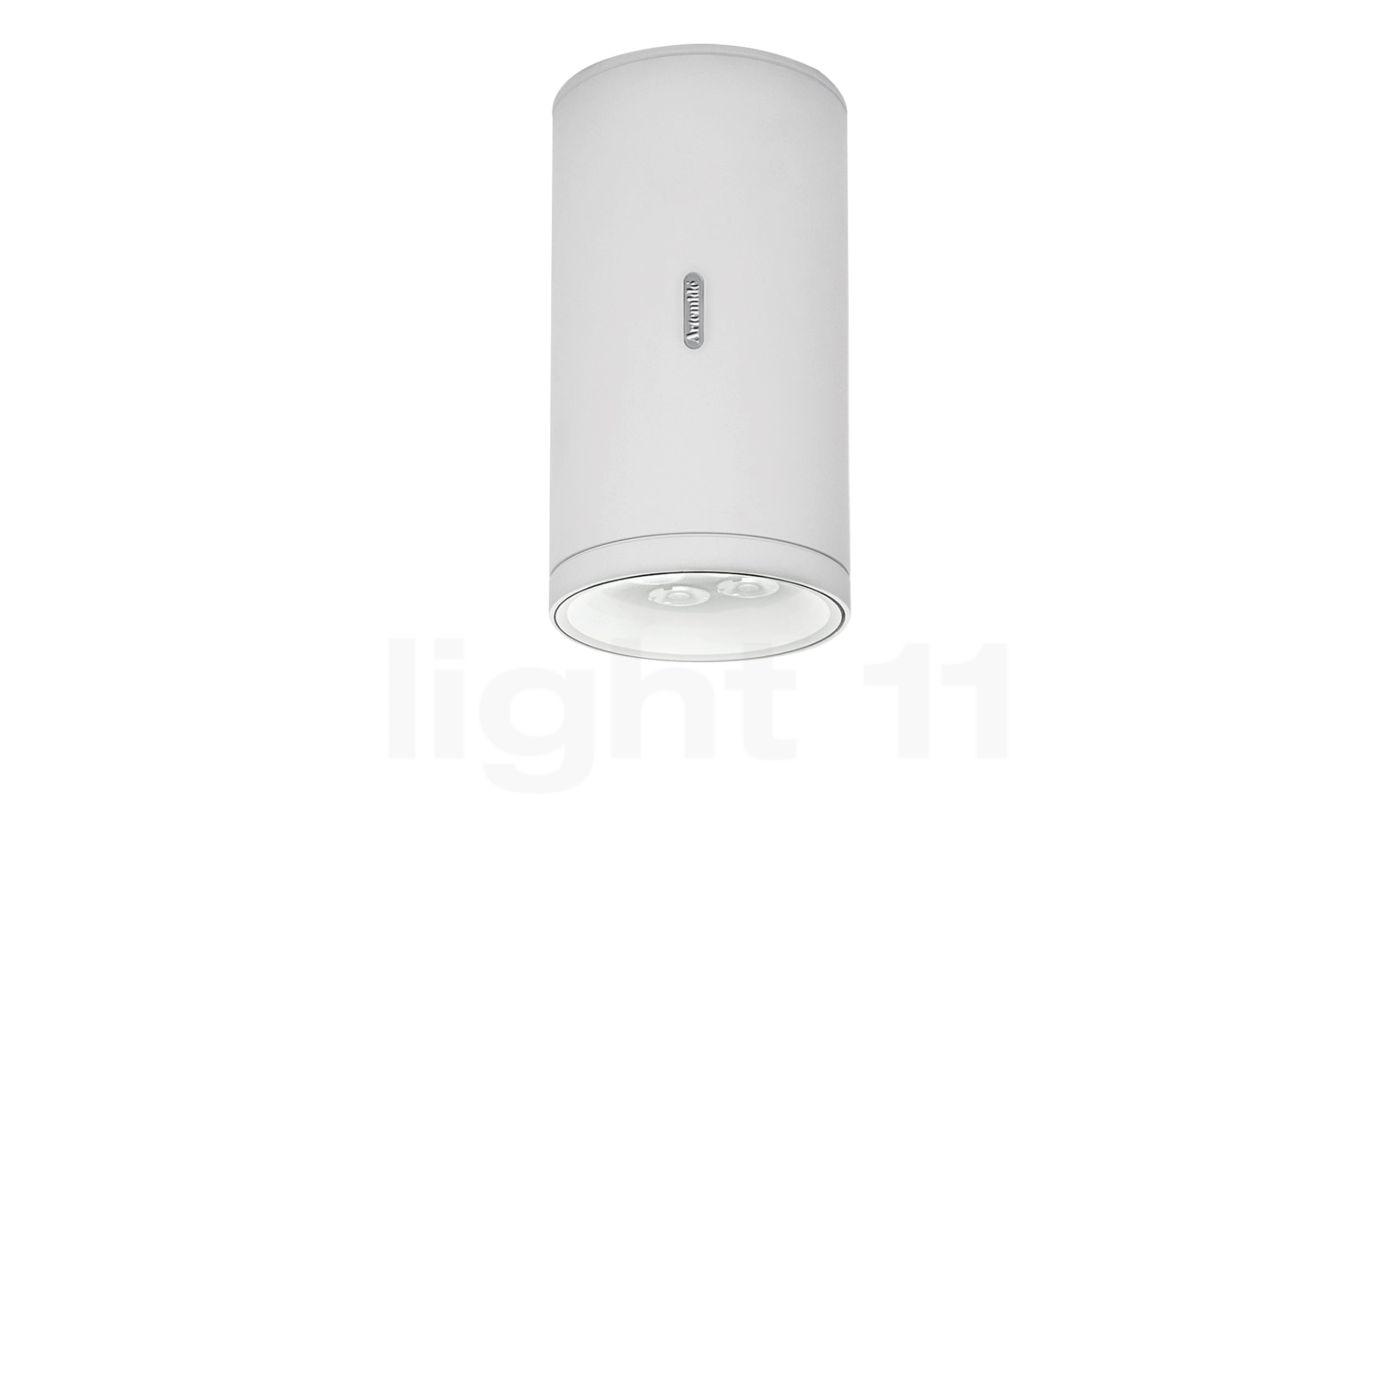 Artemide Calumet Deckenleuchte LED, weiß, 22,8 cm T41961LW00